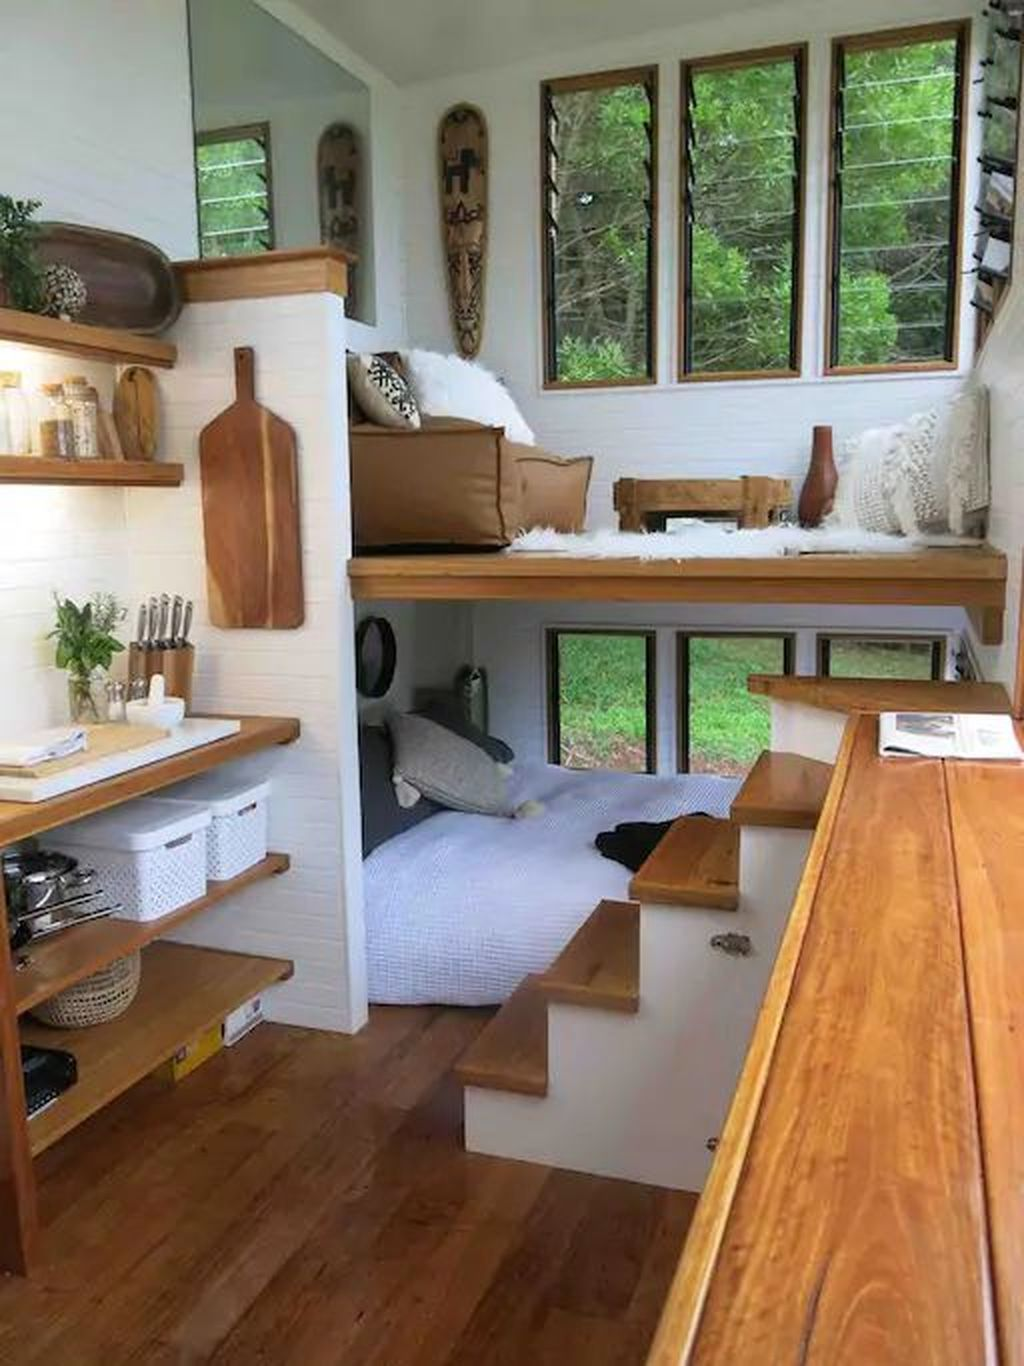 32 Amazing Cozy Tiny House Design Ideas Tiny House Decor Tiny House Interior Design Tiny House Living